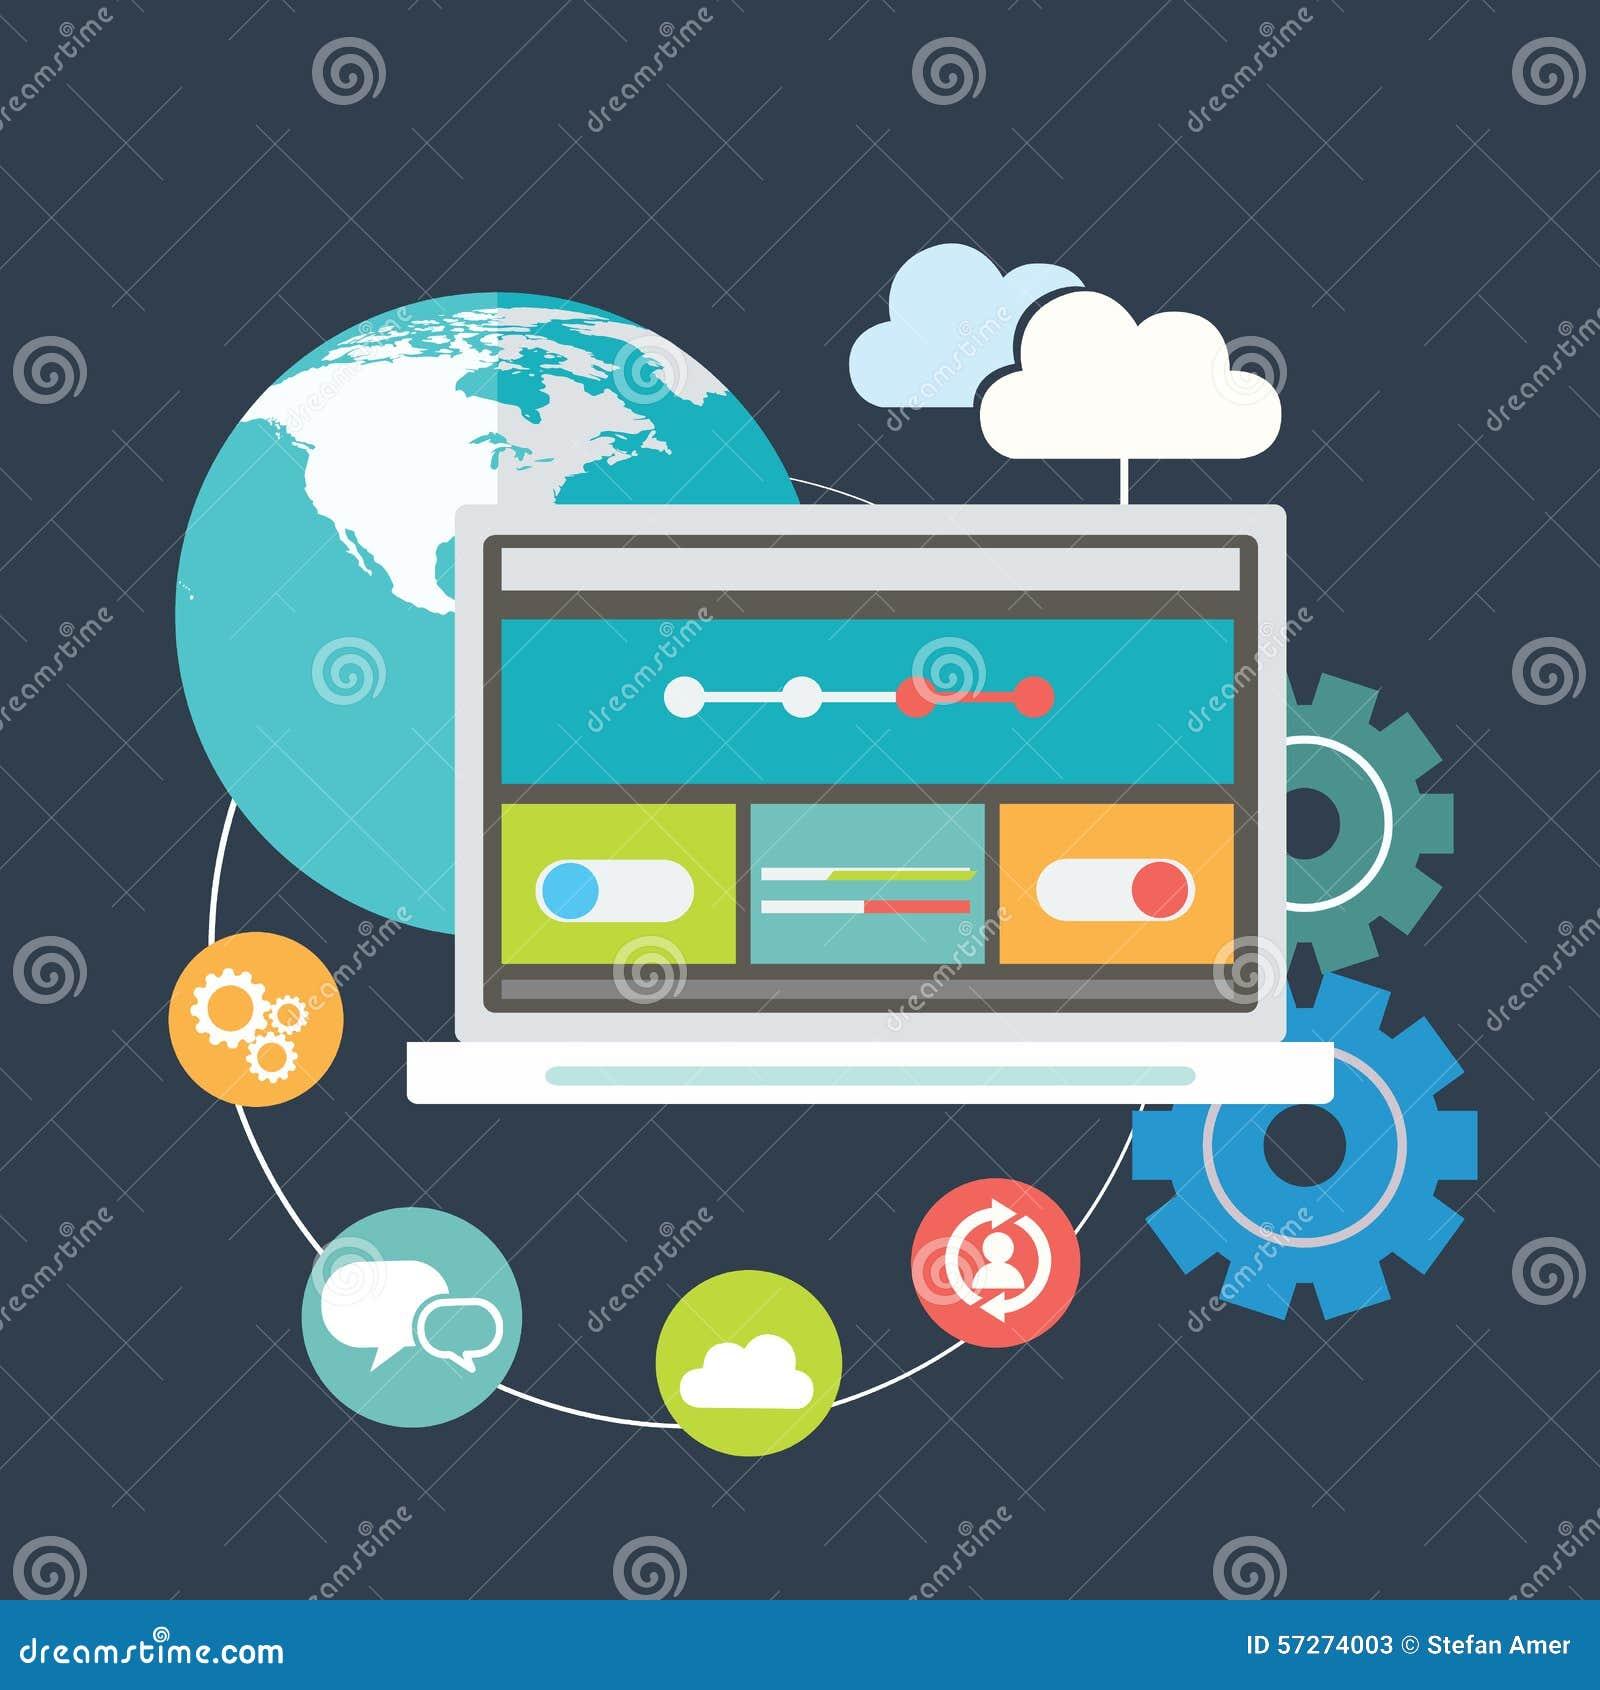 Flat design modern vector illustration icons set of website SEO optimization, programming process and web analytics elements.